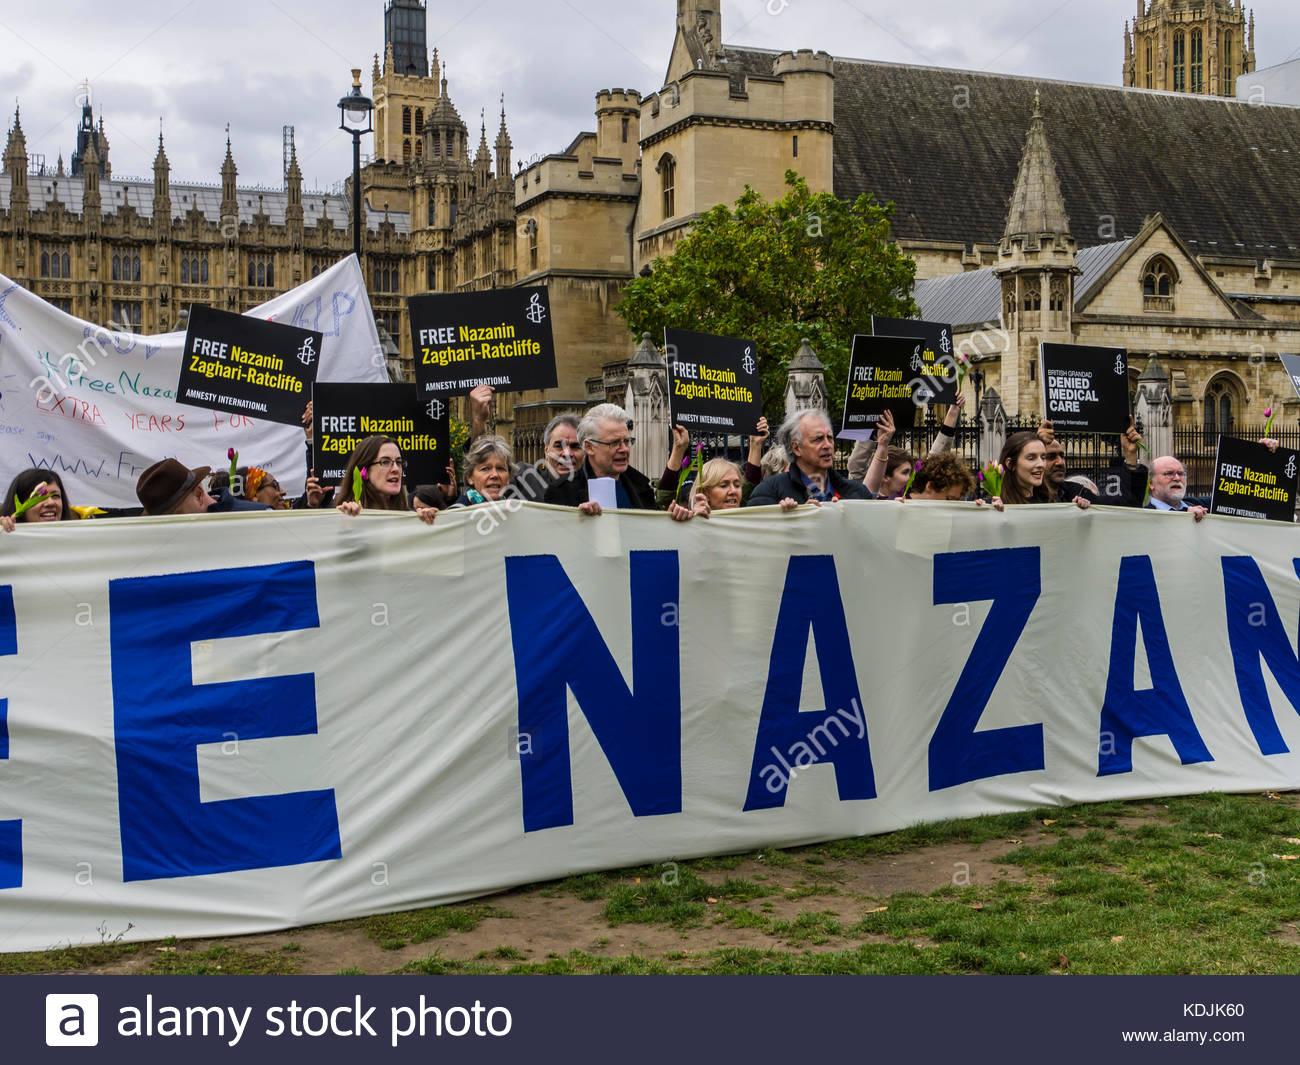 Kostenlose nazanin ratccliffe zaghari-Demo außerhalb des Parlaments London England Stockbild